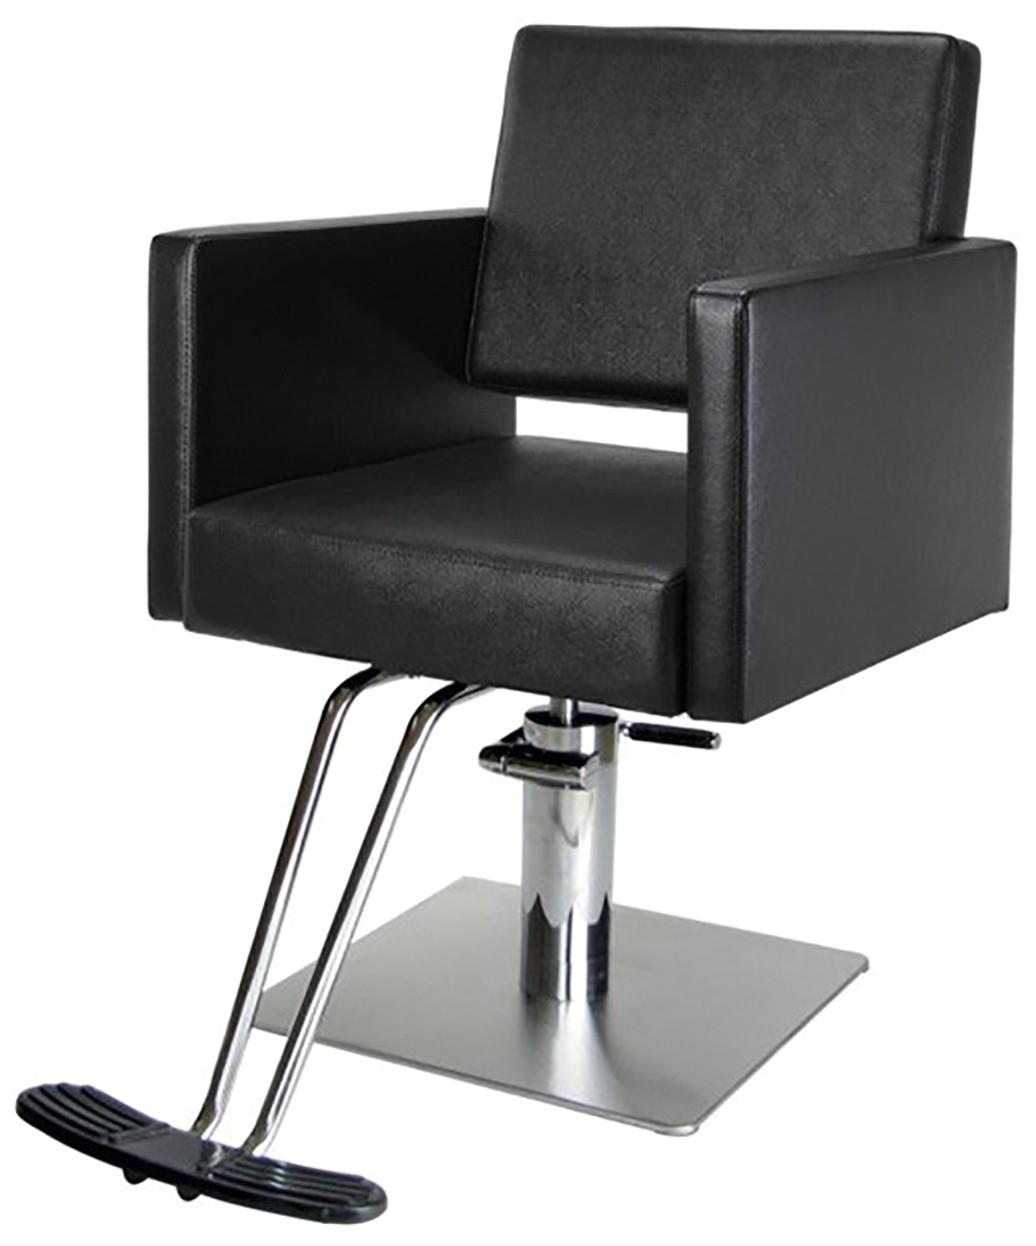 Hair Salon Shampoo Chair for Sale Aria Modern Salon Styling Chair On Square Base Buy Rite